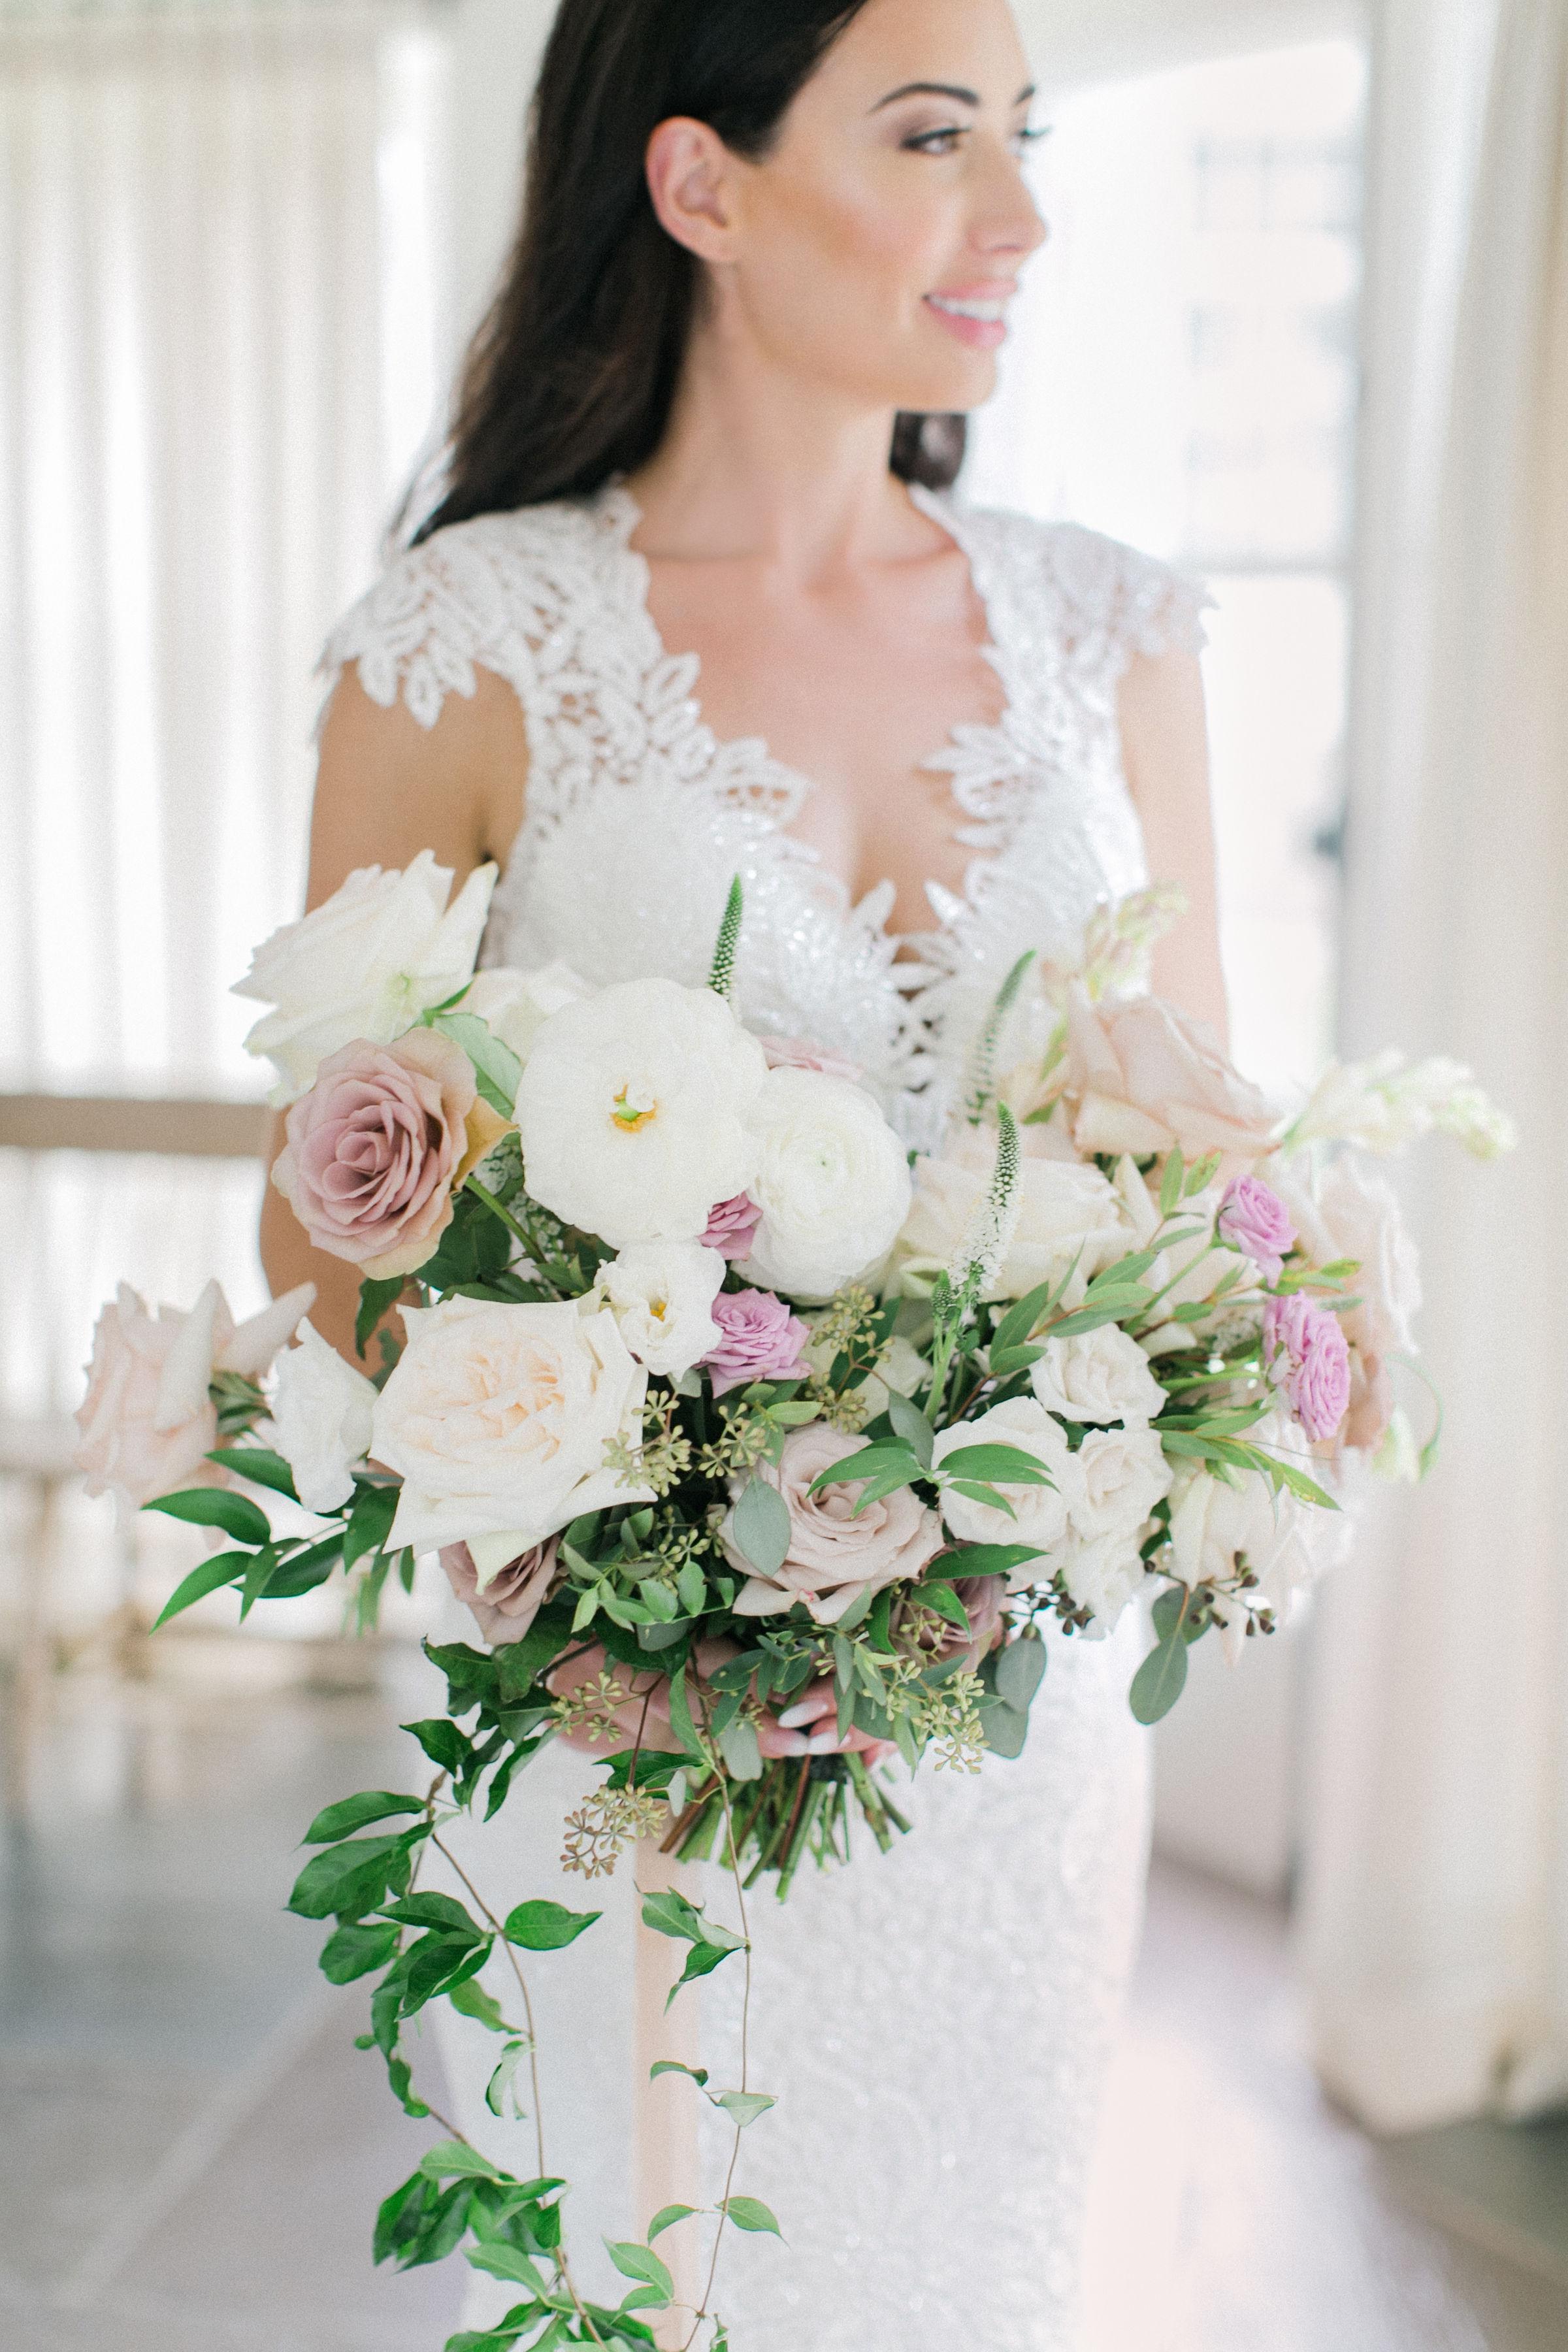 langdon-hall-wedding-toronto-photographer-soft-airy-kurtz-bre-tom-firshade-114.jpg